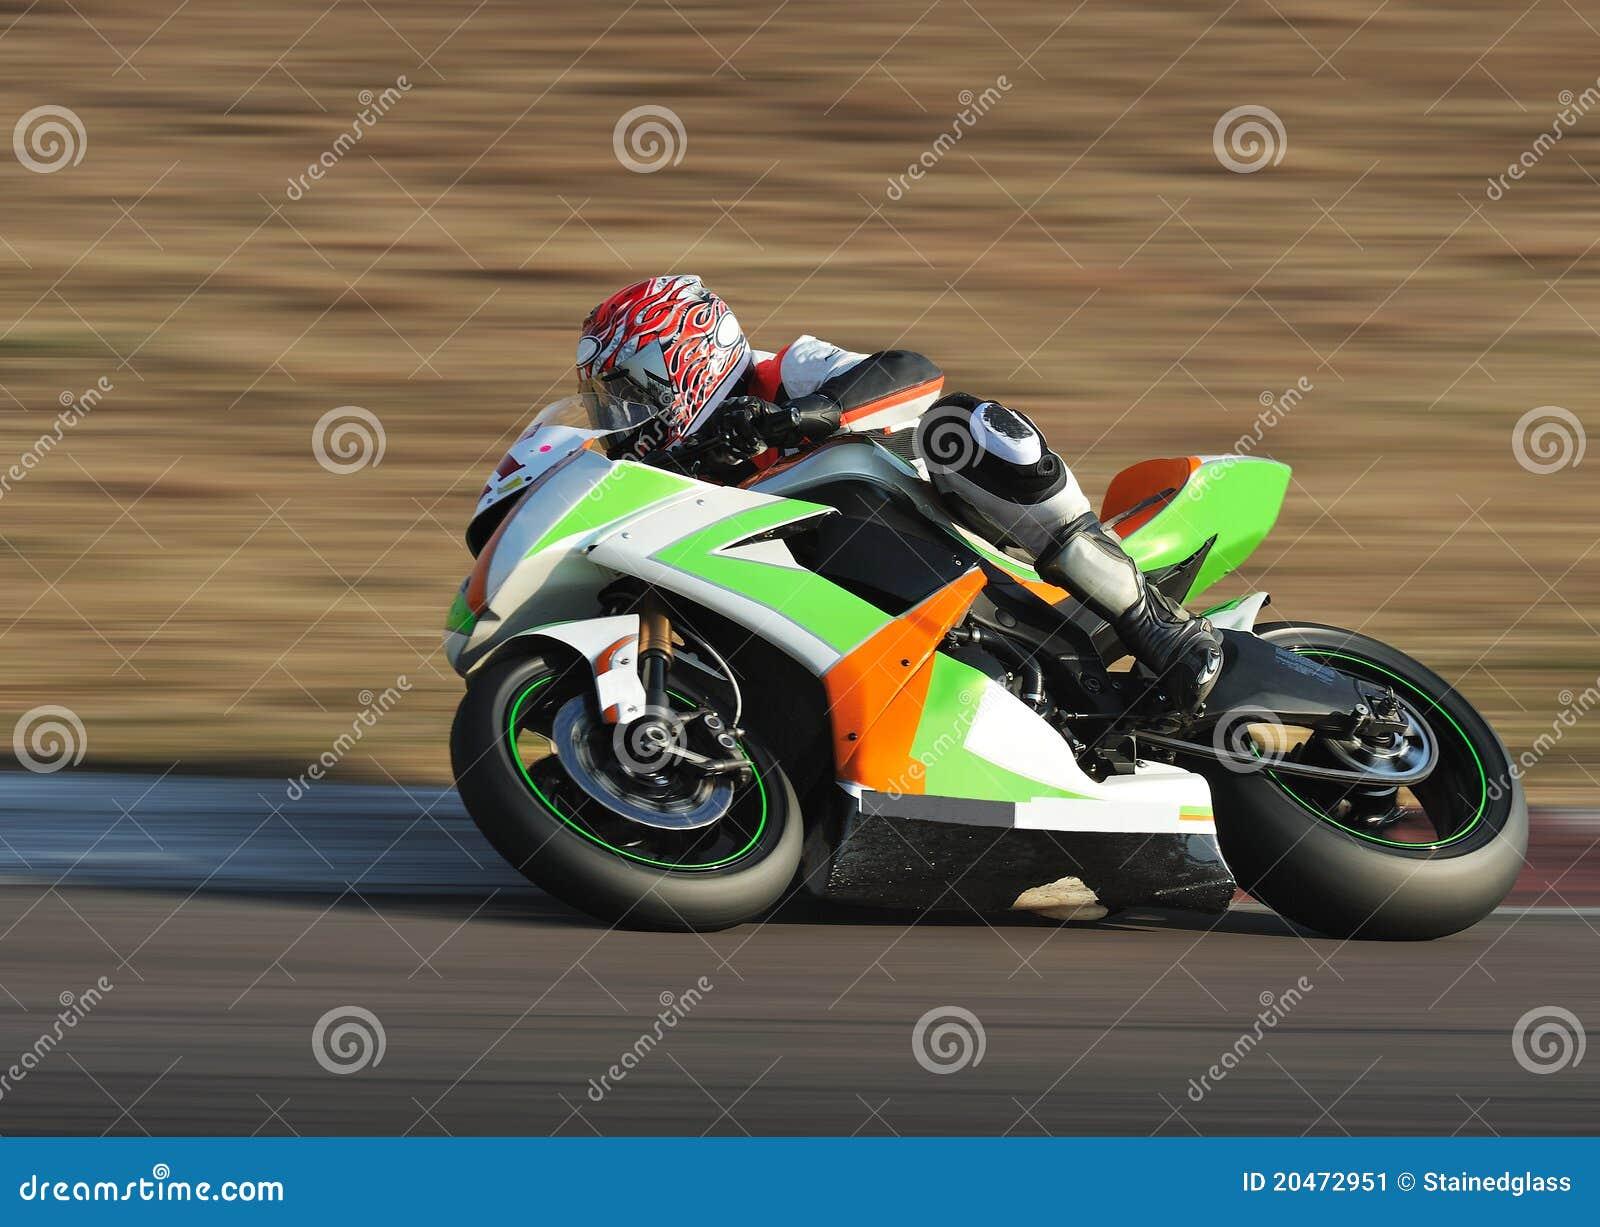 Bike Cornering at Full Speed